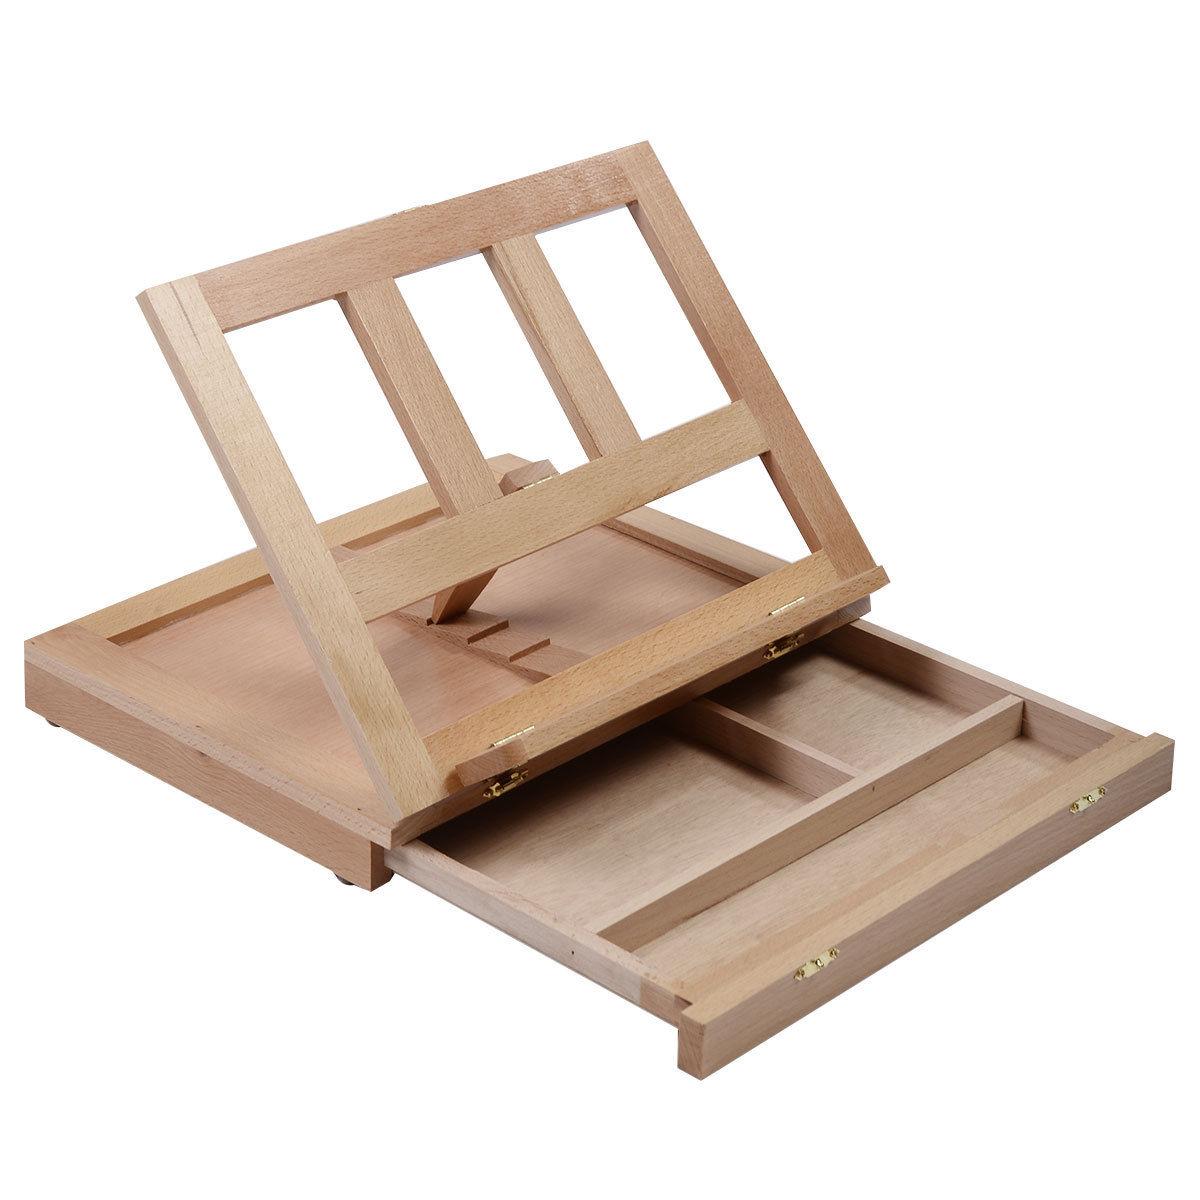 1pcs Folding&Portable Artist Desk Easel Wood Multi Positions Sketching Sketch Drawer aluminum folding retractable color easel folding easel sketch new videos